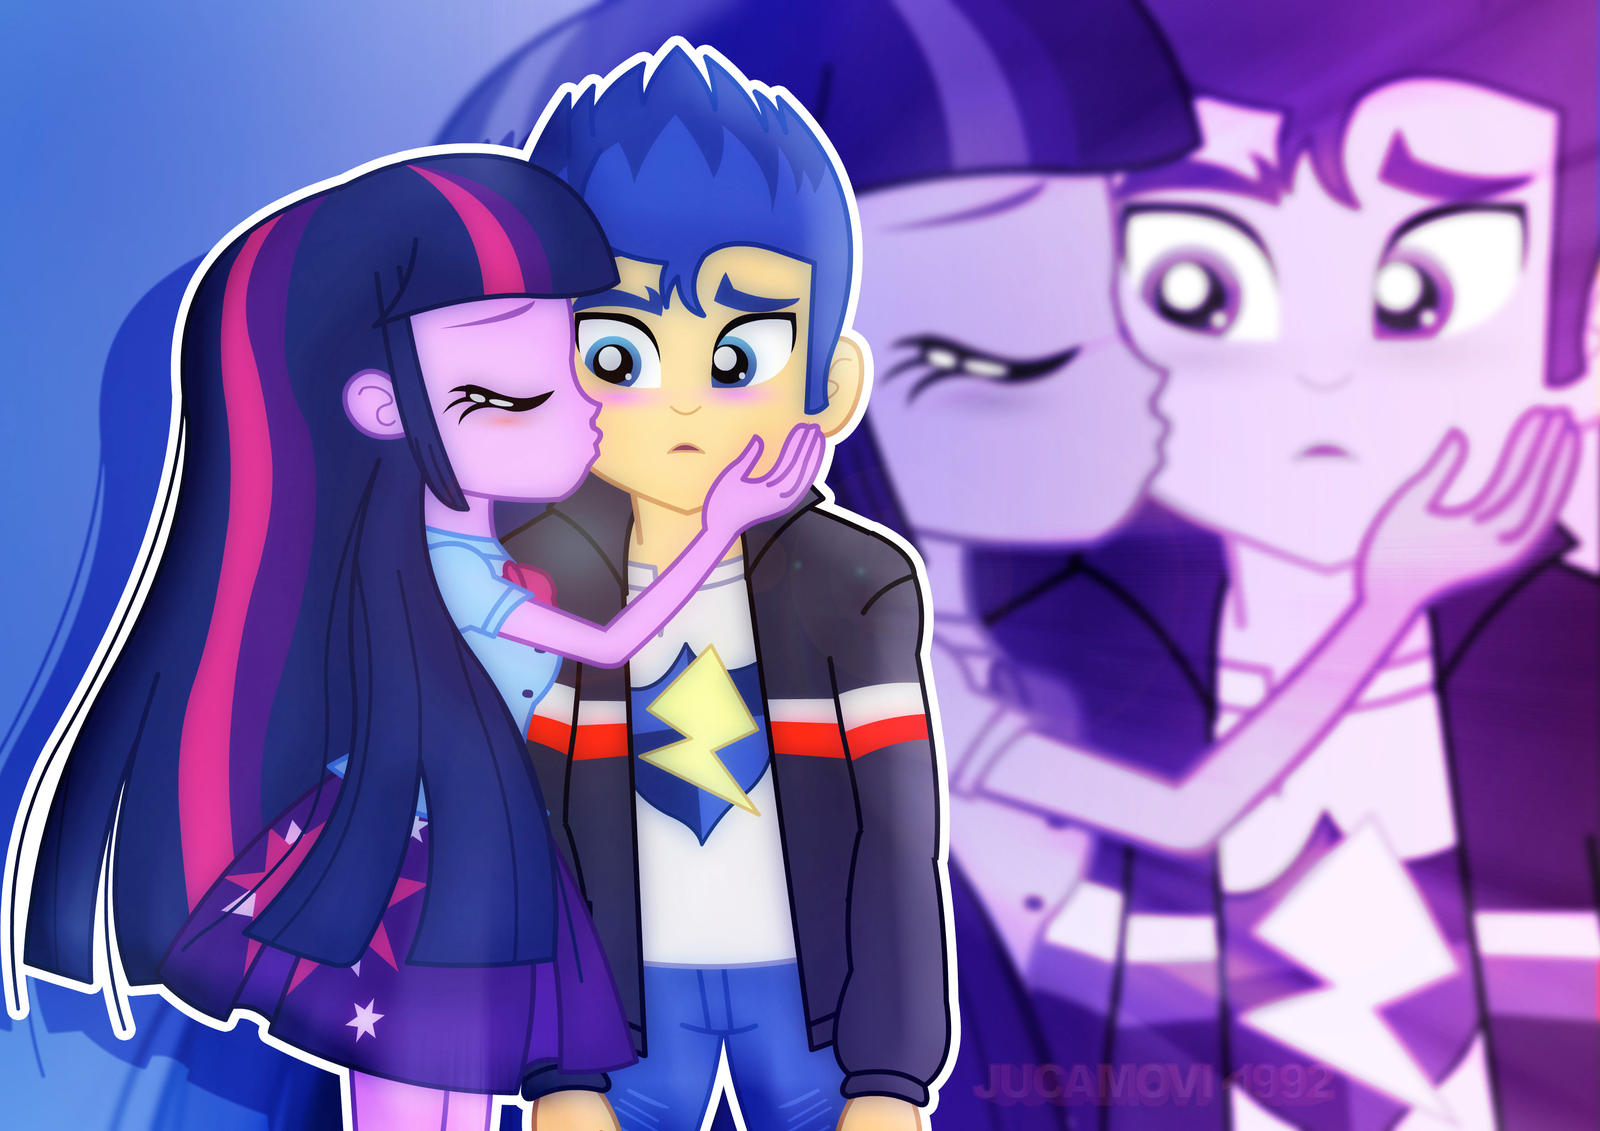 My little pony princess twilight sparkle and flash sentry kiss - photo#44